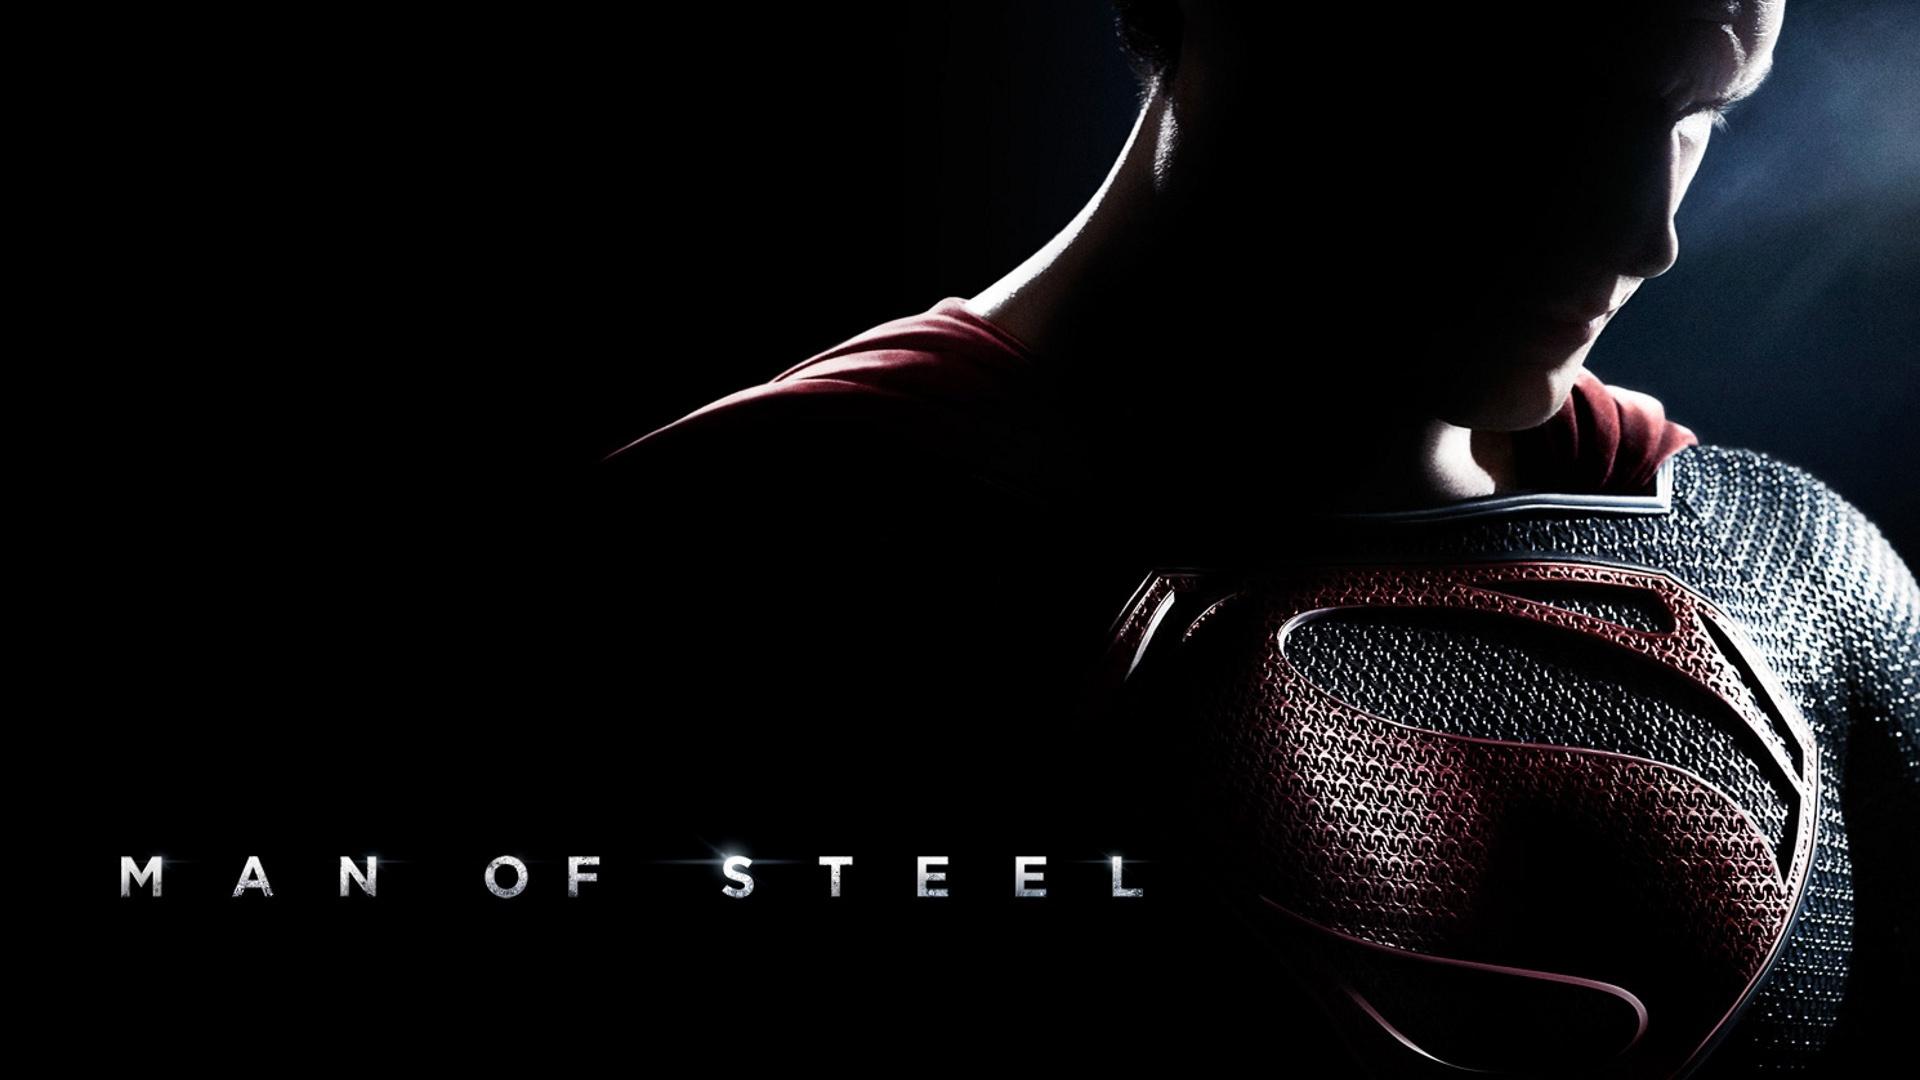 man-of-steel-movie-image